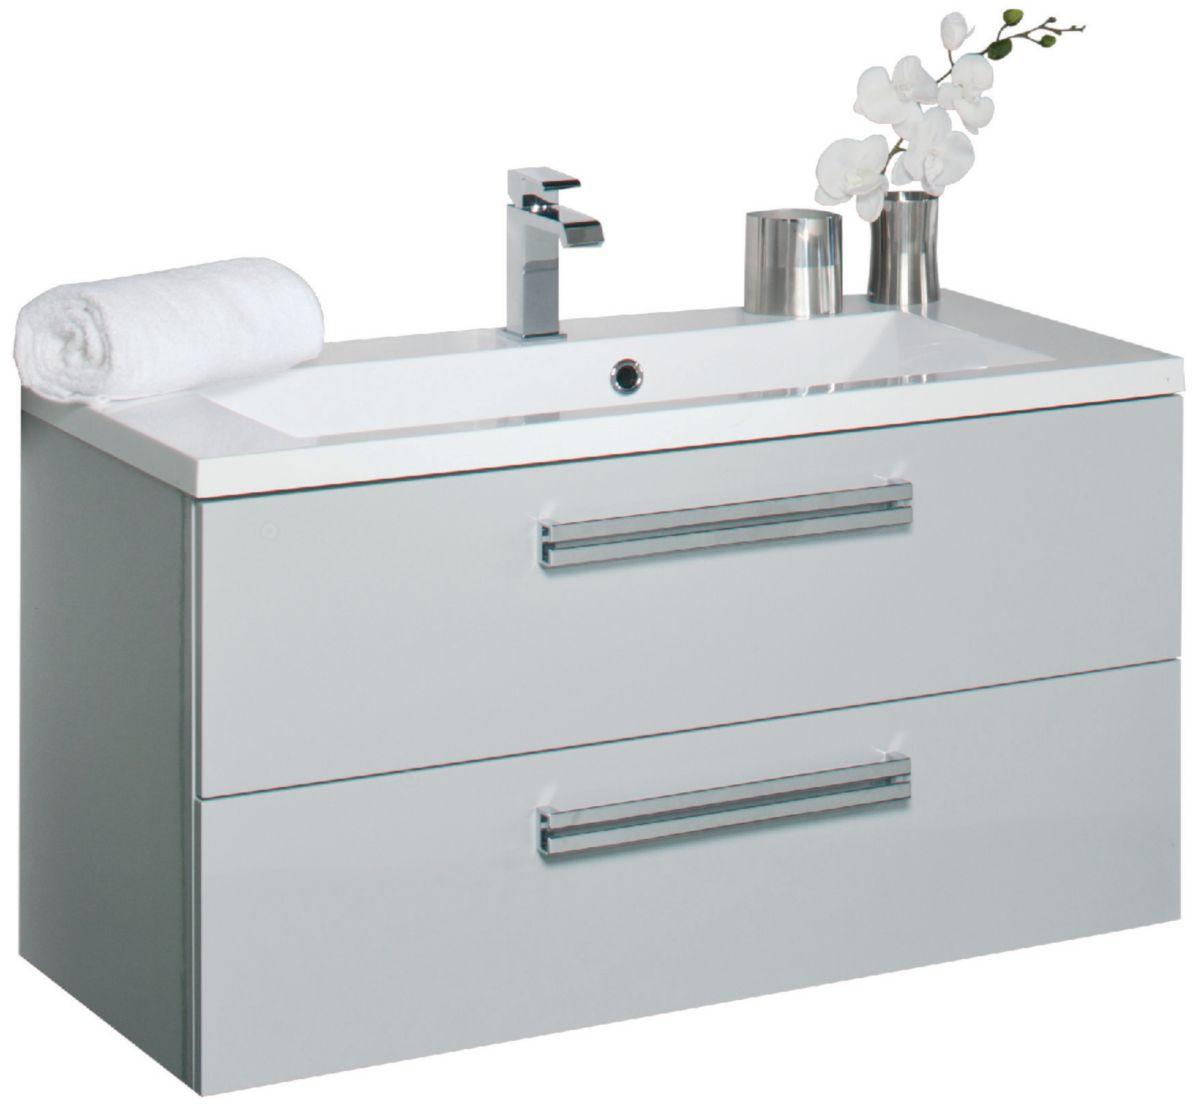 alterna meuble sous vasque seducta 90 cm 2 tiroirs gris perle cedeo